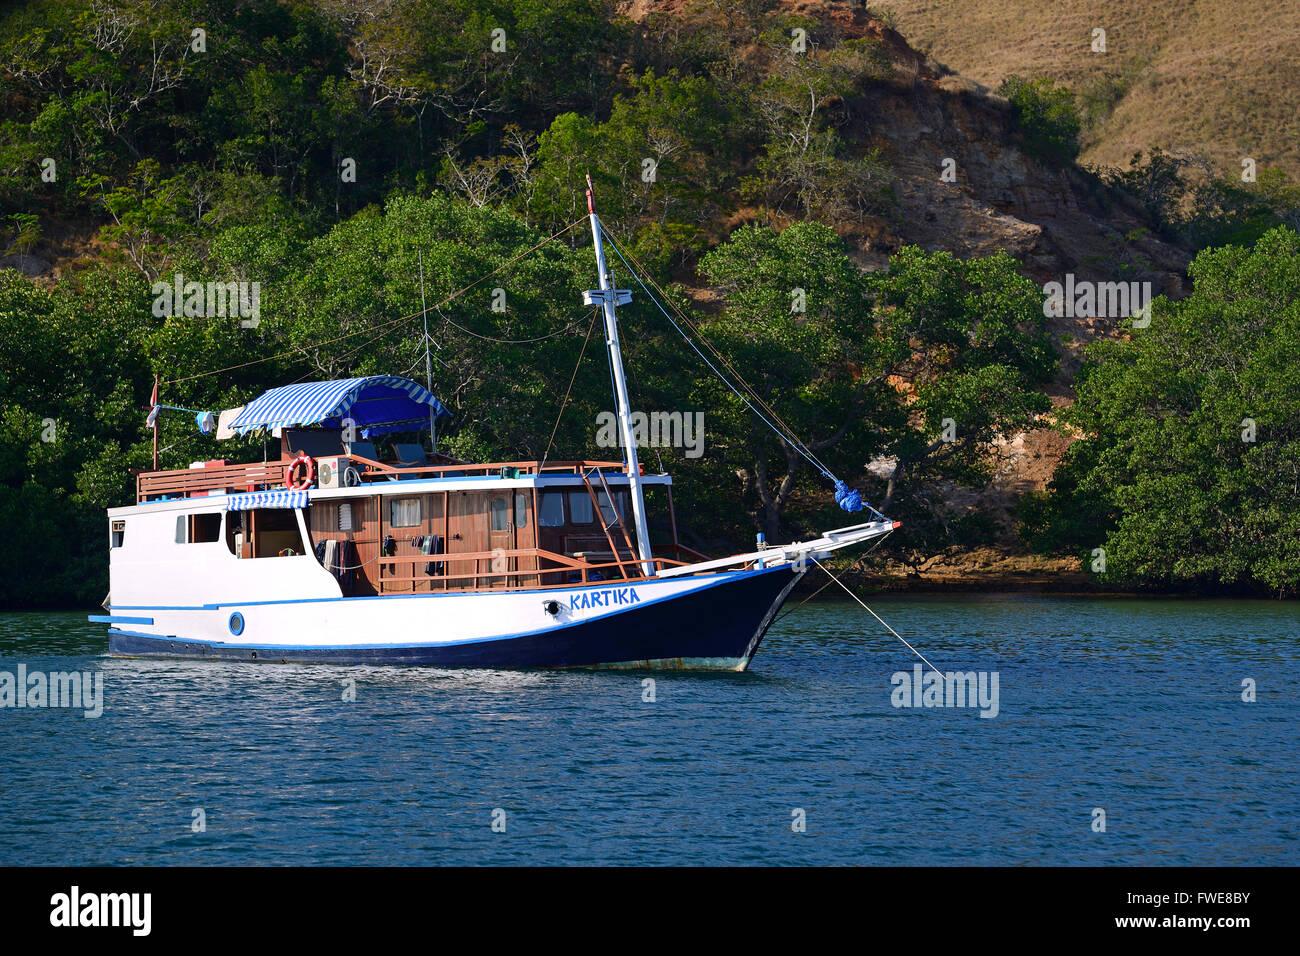 Typical tourist ship anchoring off Rinca Island, Komodo National Park, UNESCO World Heritage Site, Indonesia, Asia - Stock Image